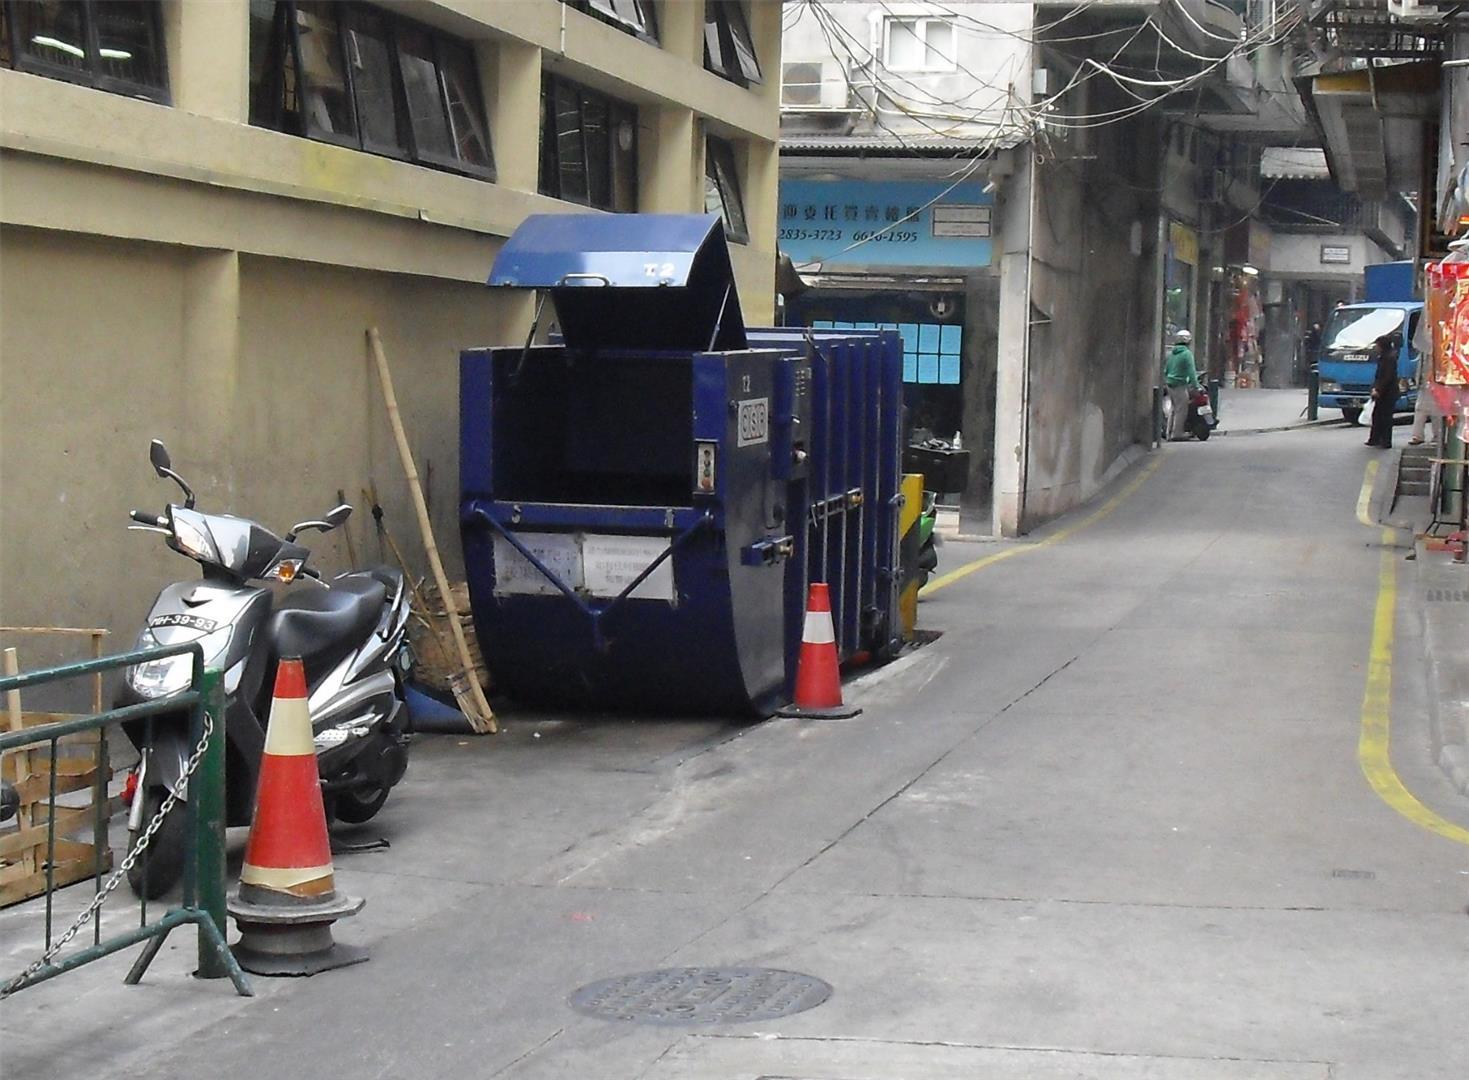 M7 Compacting trash bin outside Horta e Mitra Market